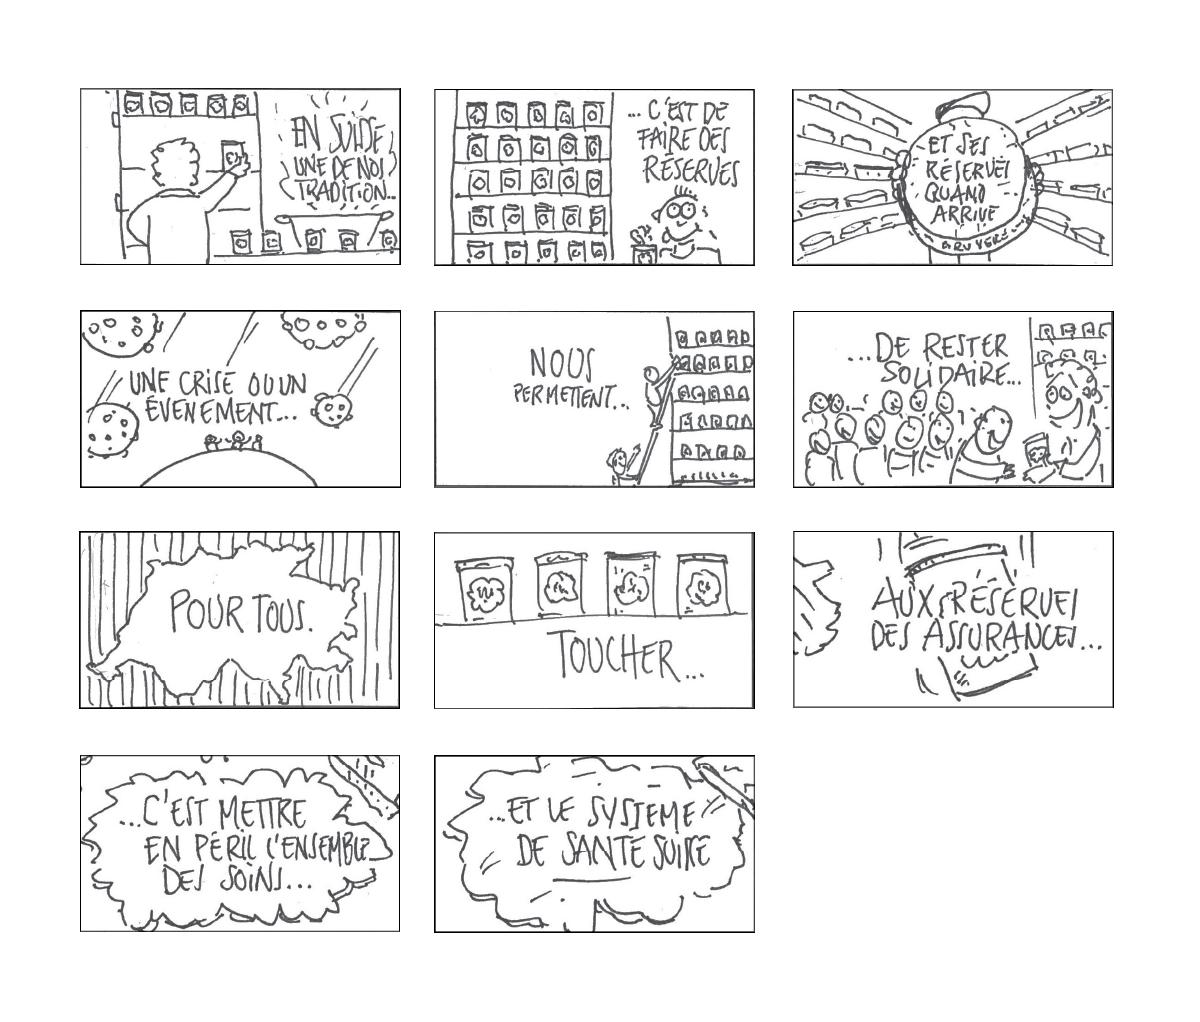 santesuisse-storyboard-enigma